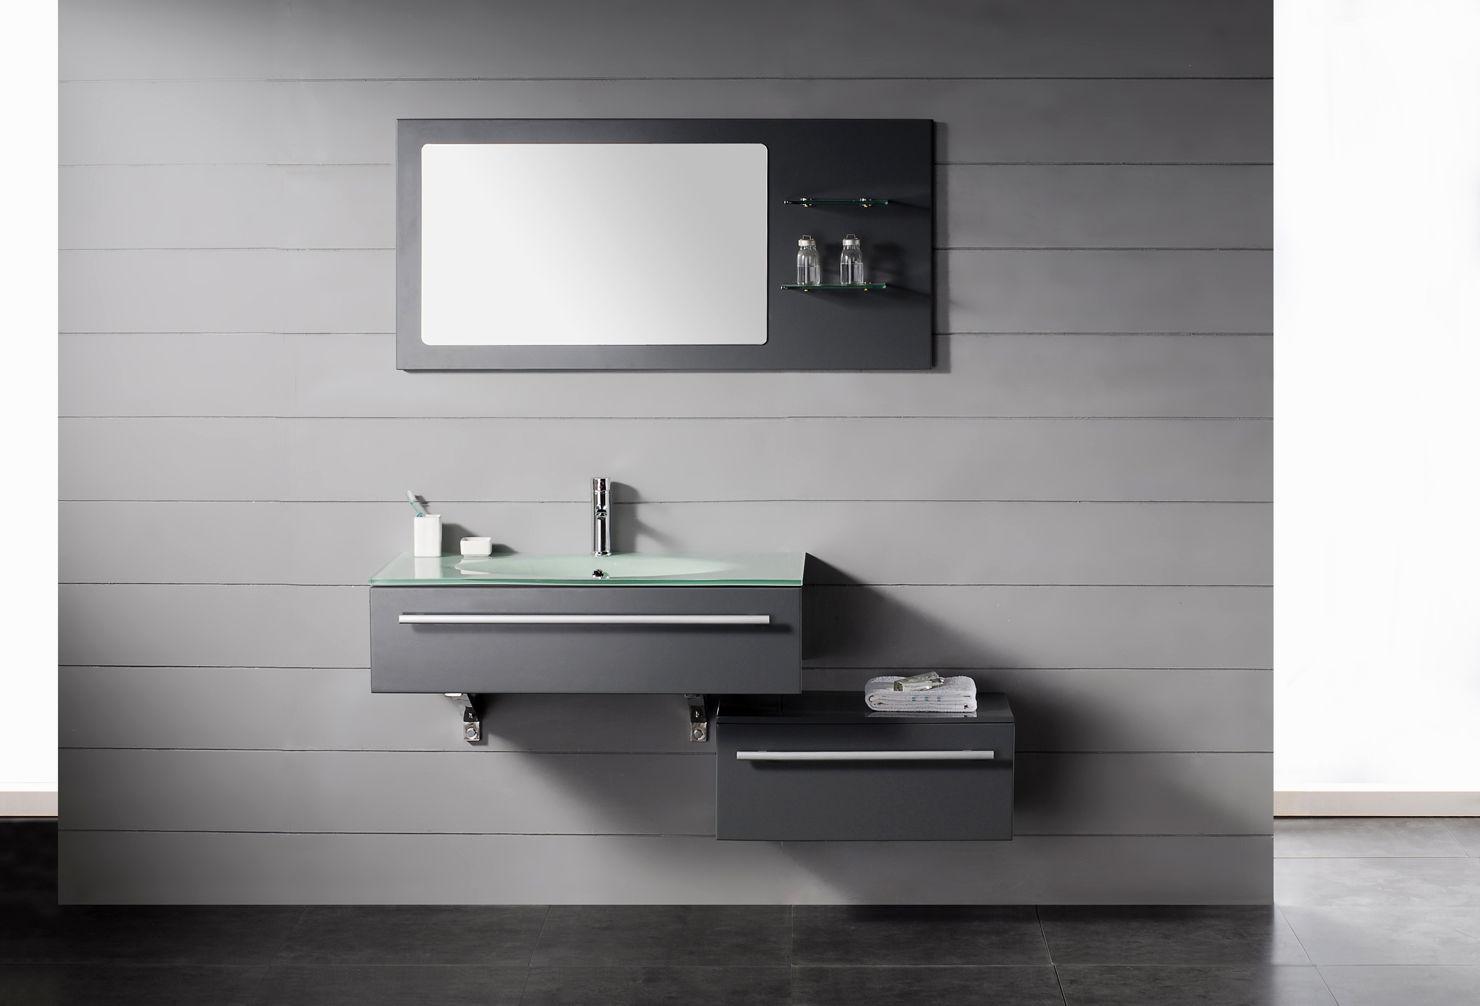 Unique Bathroom Vanities for Sale Ideas - Home Sweet Home ...